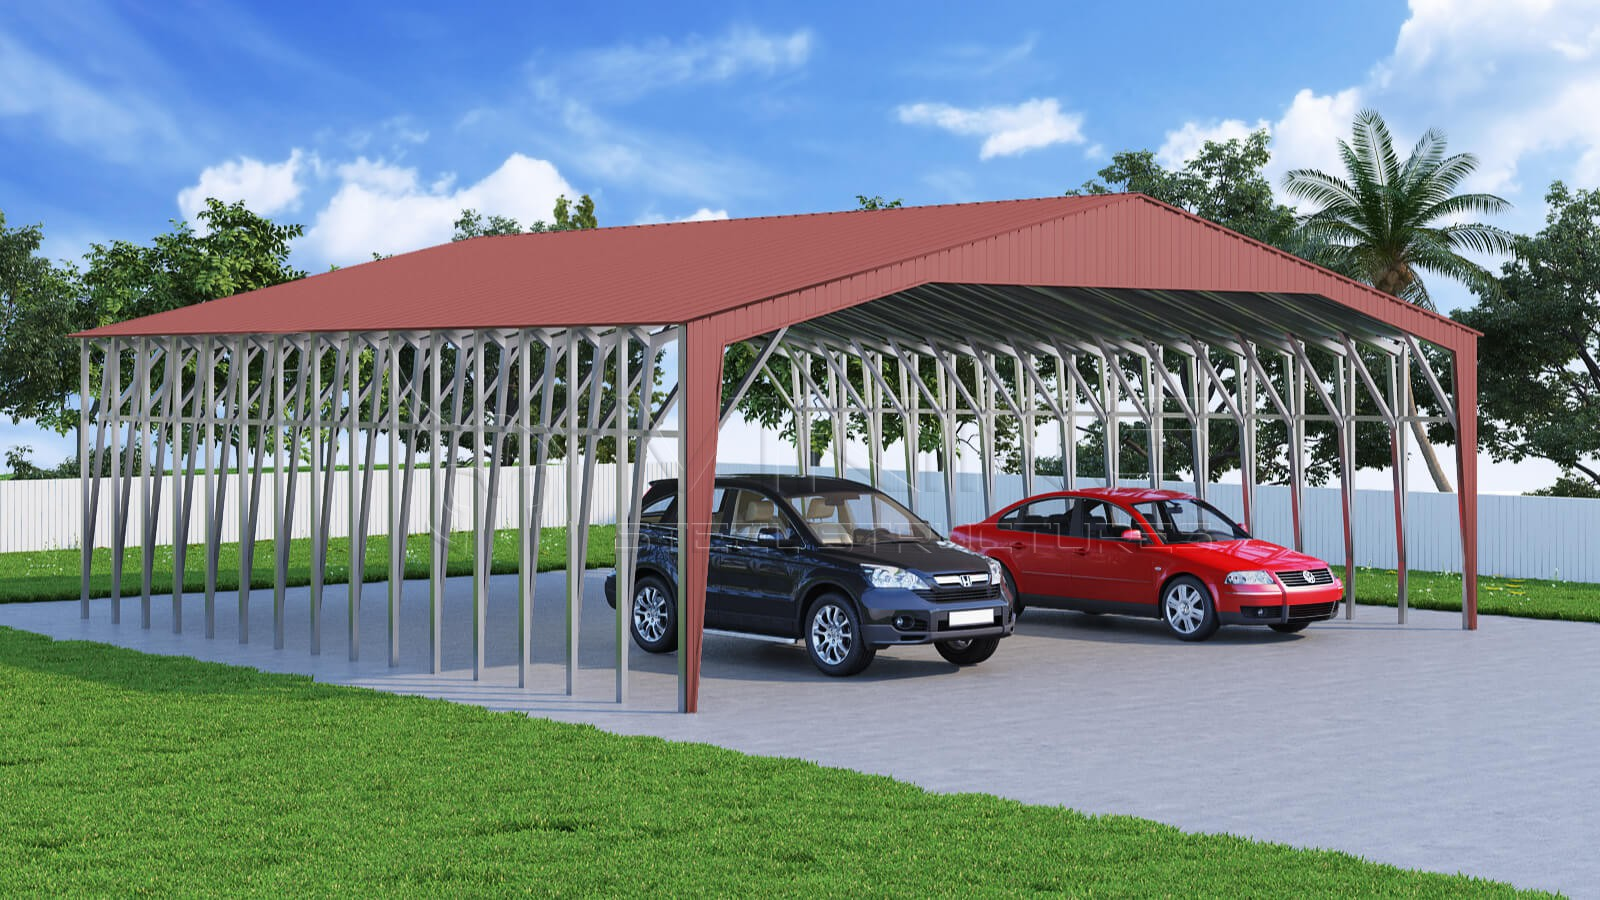 34x36-steel-carport-structure-left-ebrown-image